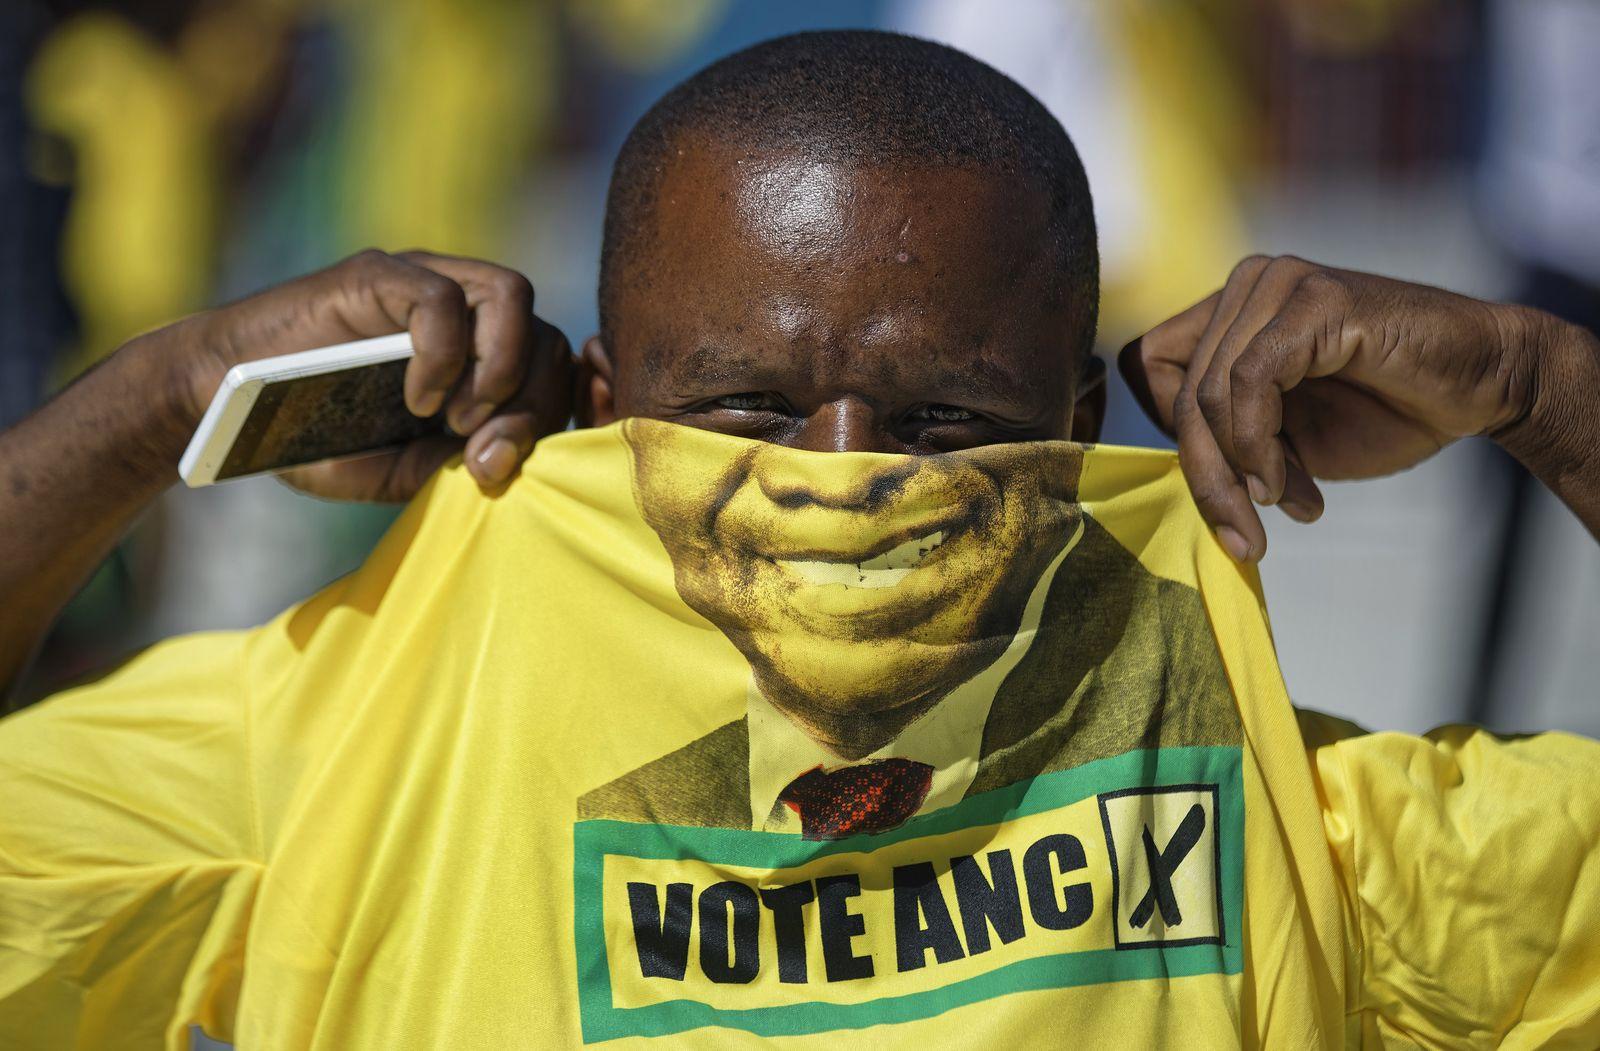 Südafrika Wahlen / ANC-Anhänger